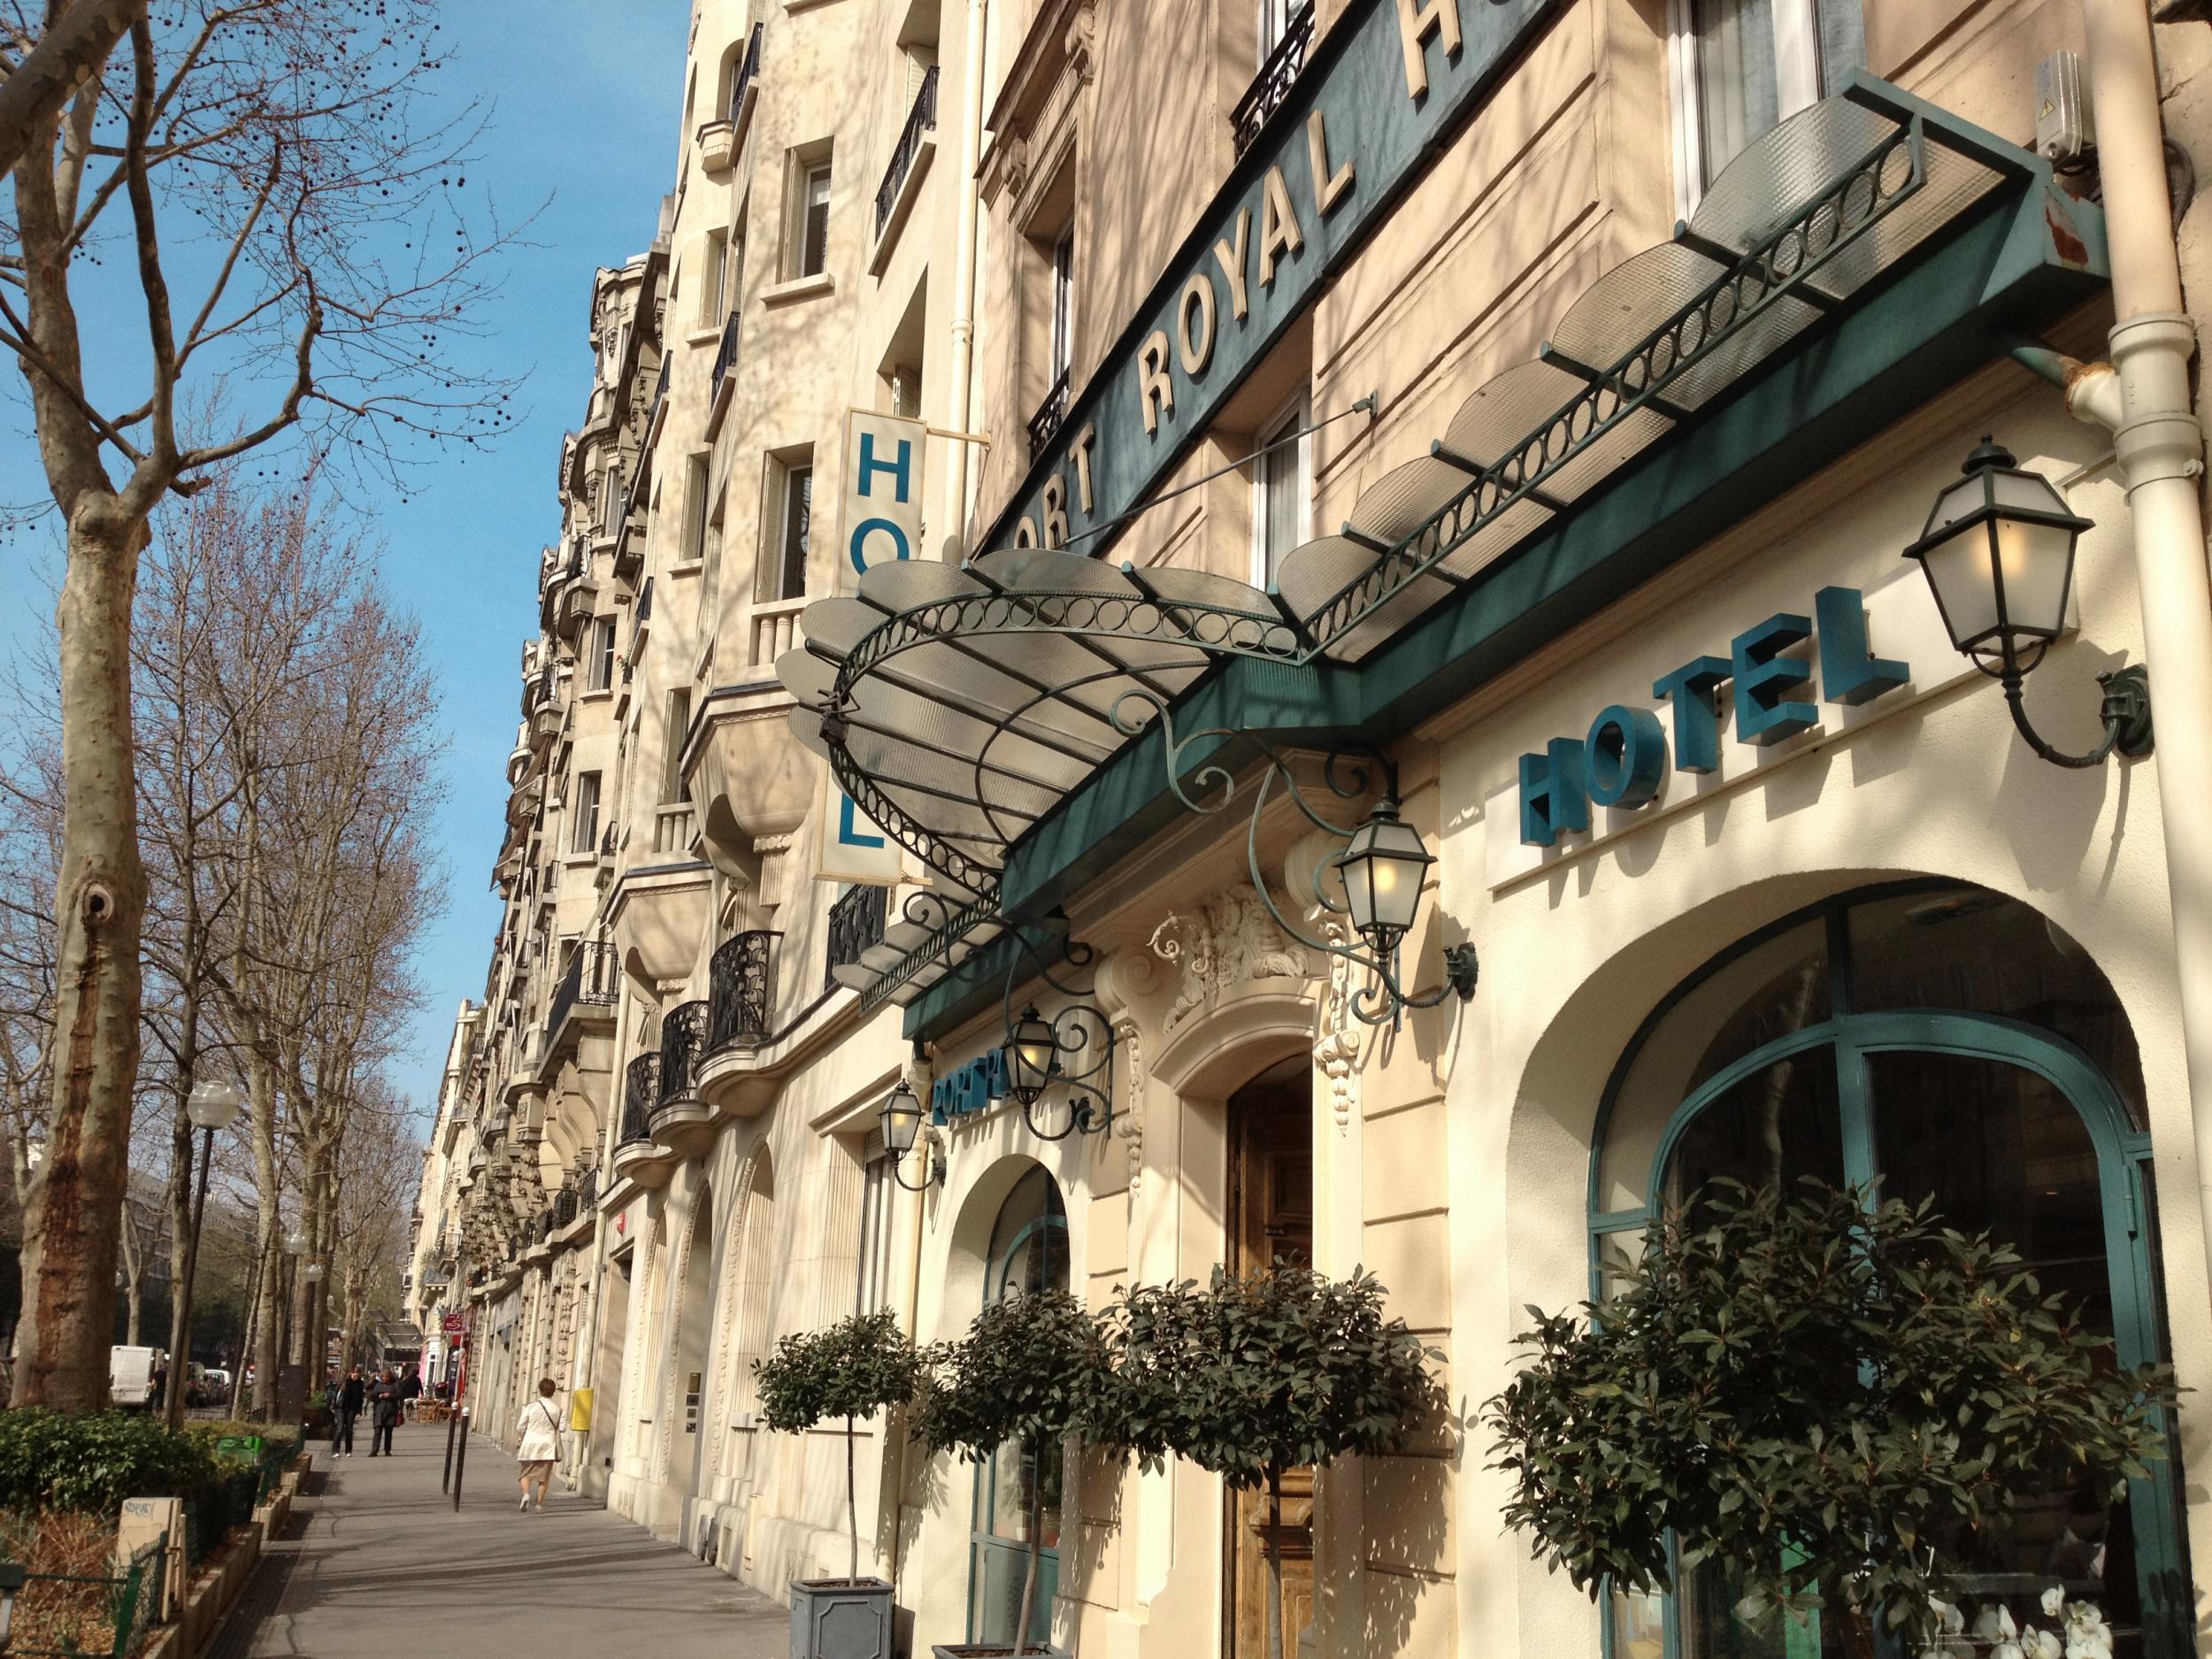 Paris budget hotels: 10 best value of money locations under €100